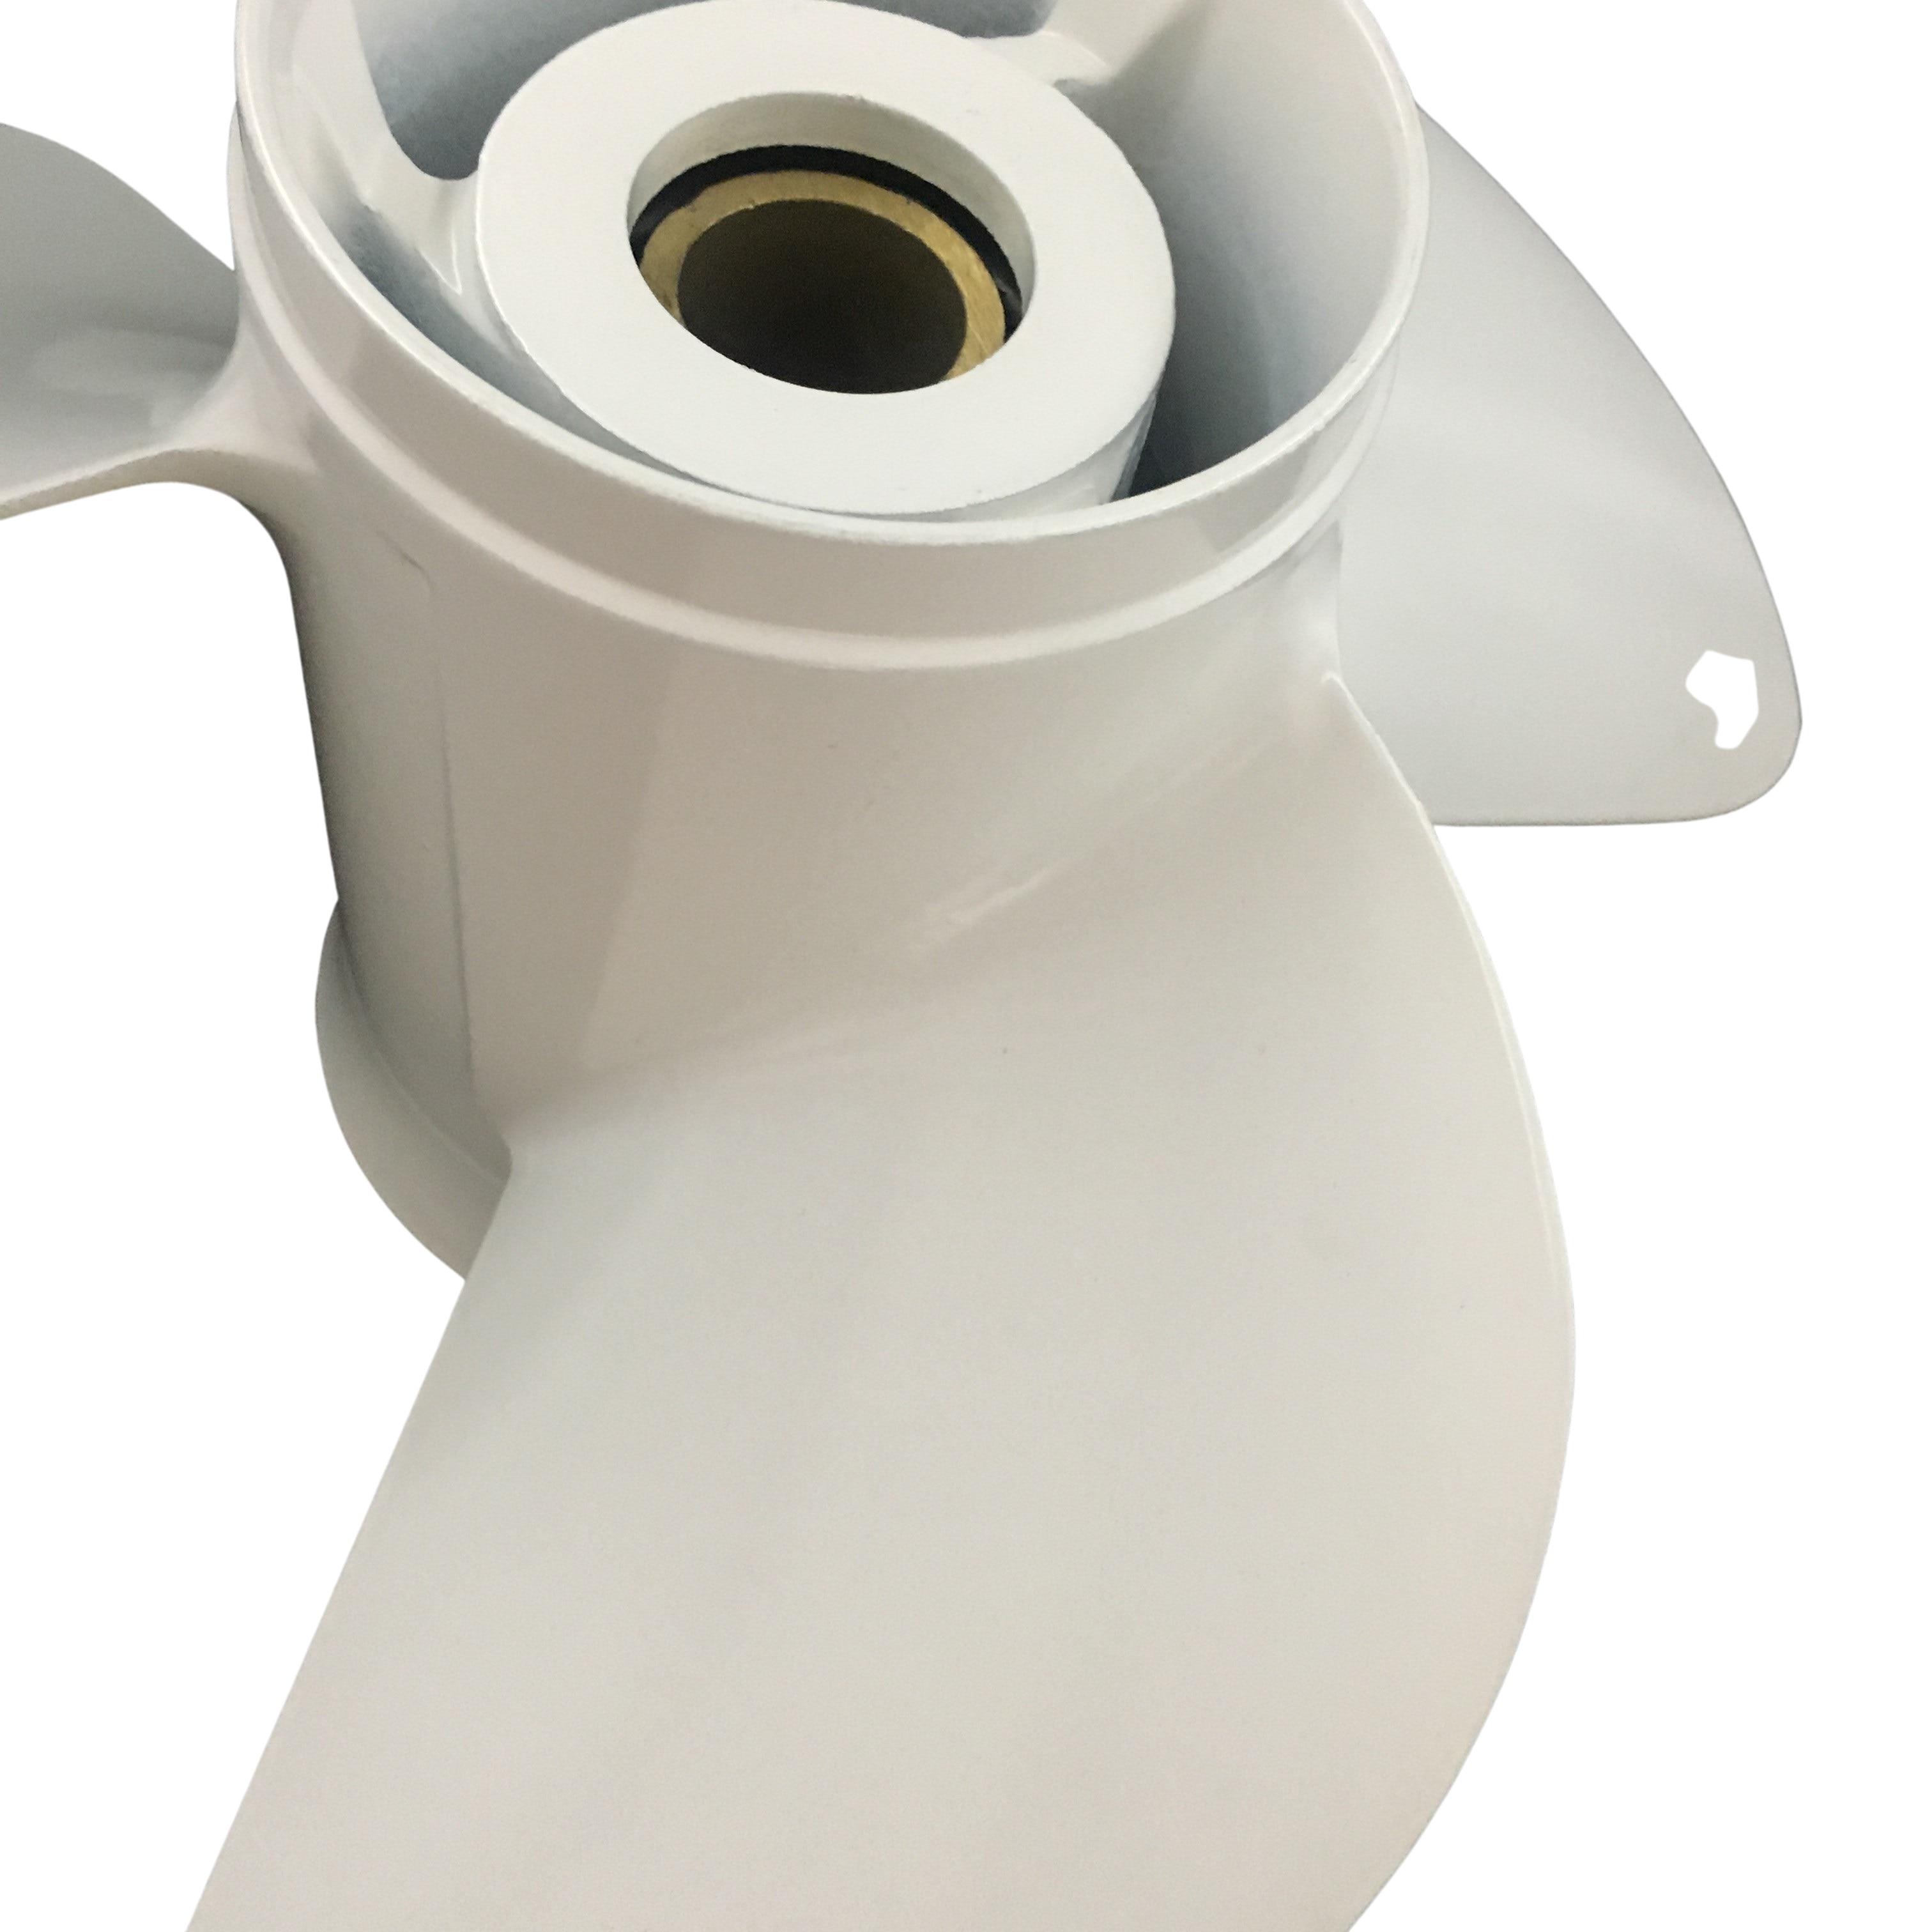 Boat propeller suit for Yamaha 13 1 2x15 aluminum prop 60-115HP 3 blade 15 tooth RH OEM No: 6E5-45947-00-EL enlarge